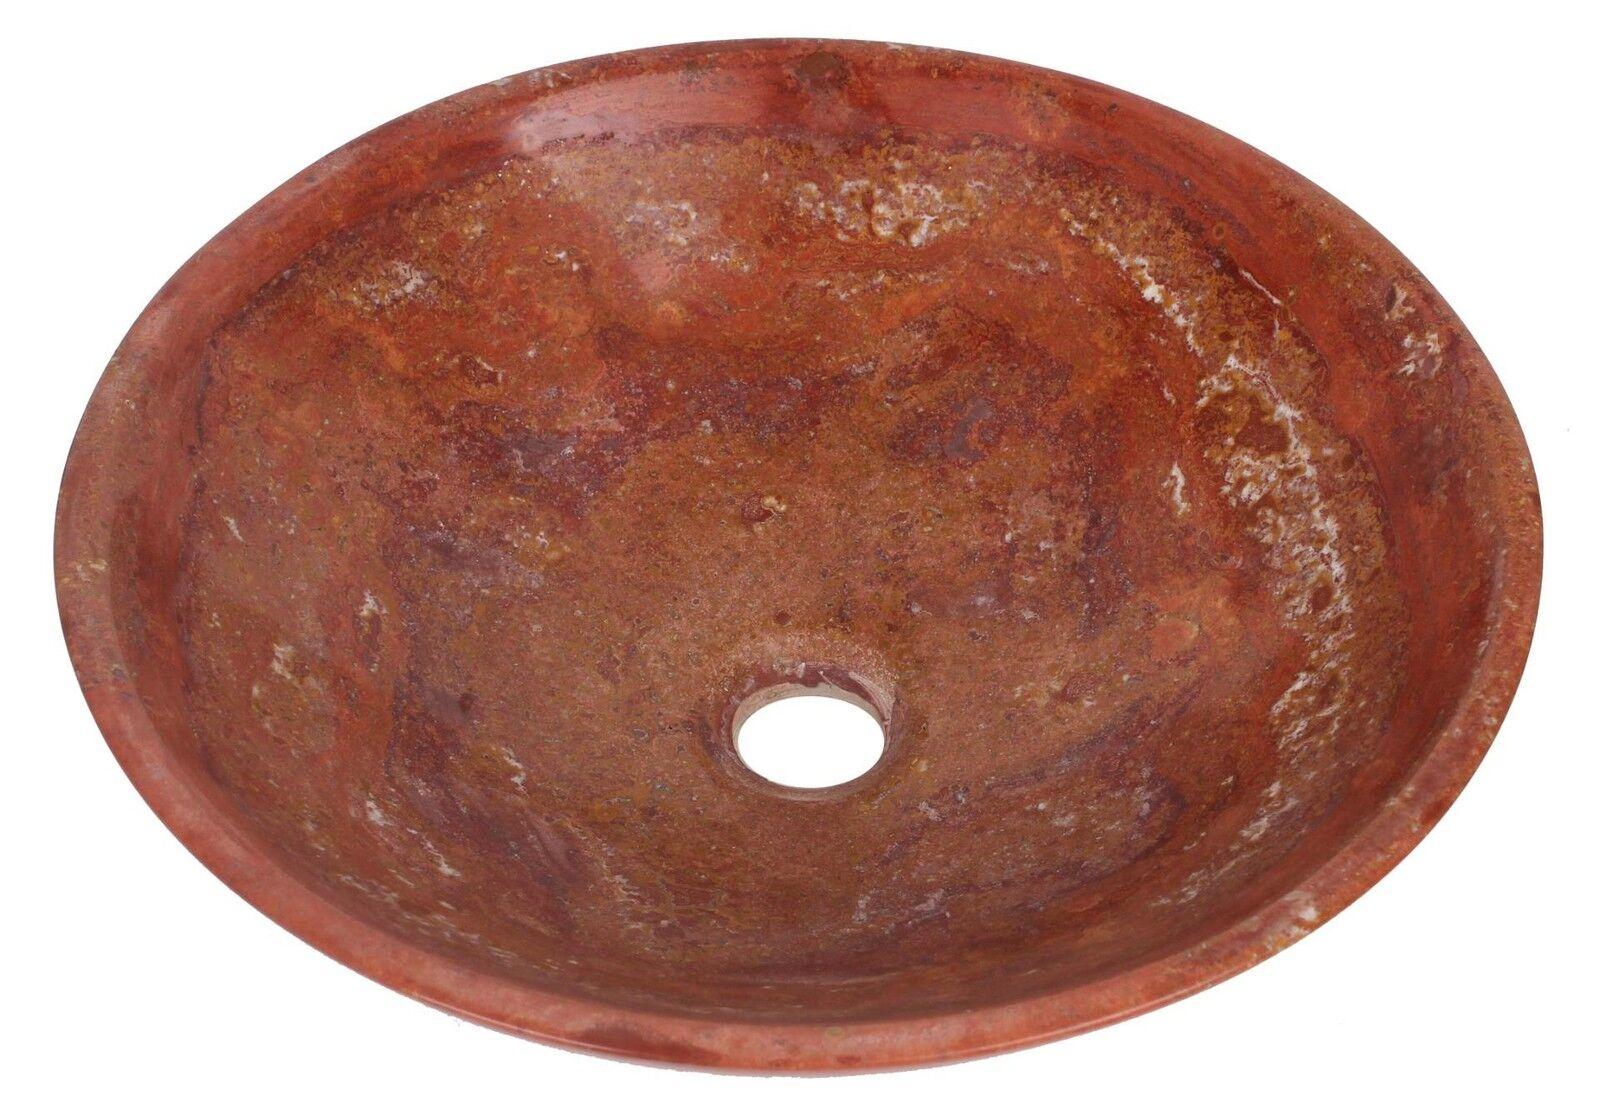 Travertin marbre rond bol salle de bains de lavabo diamètre 350mm B0064